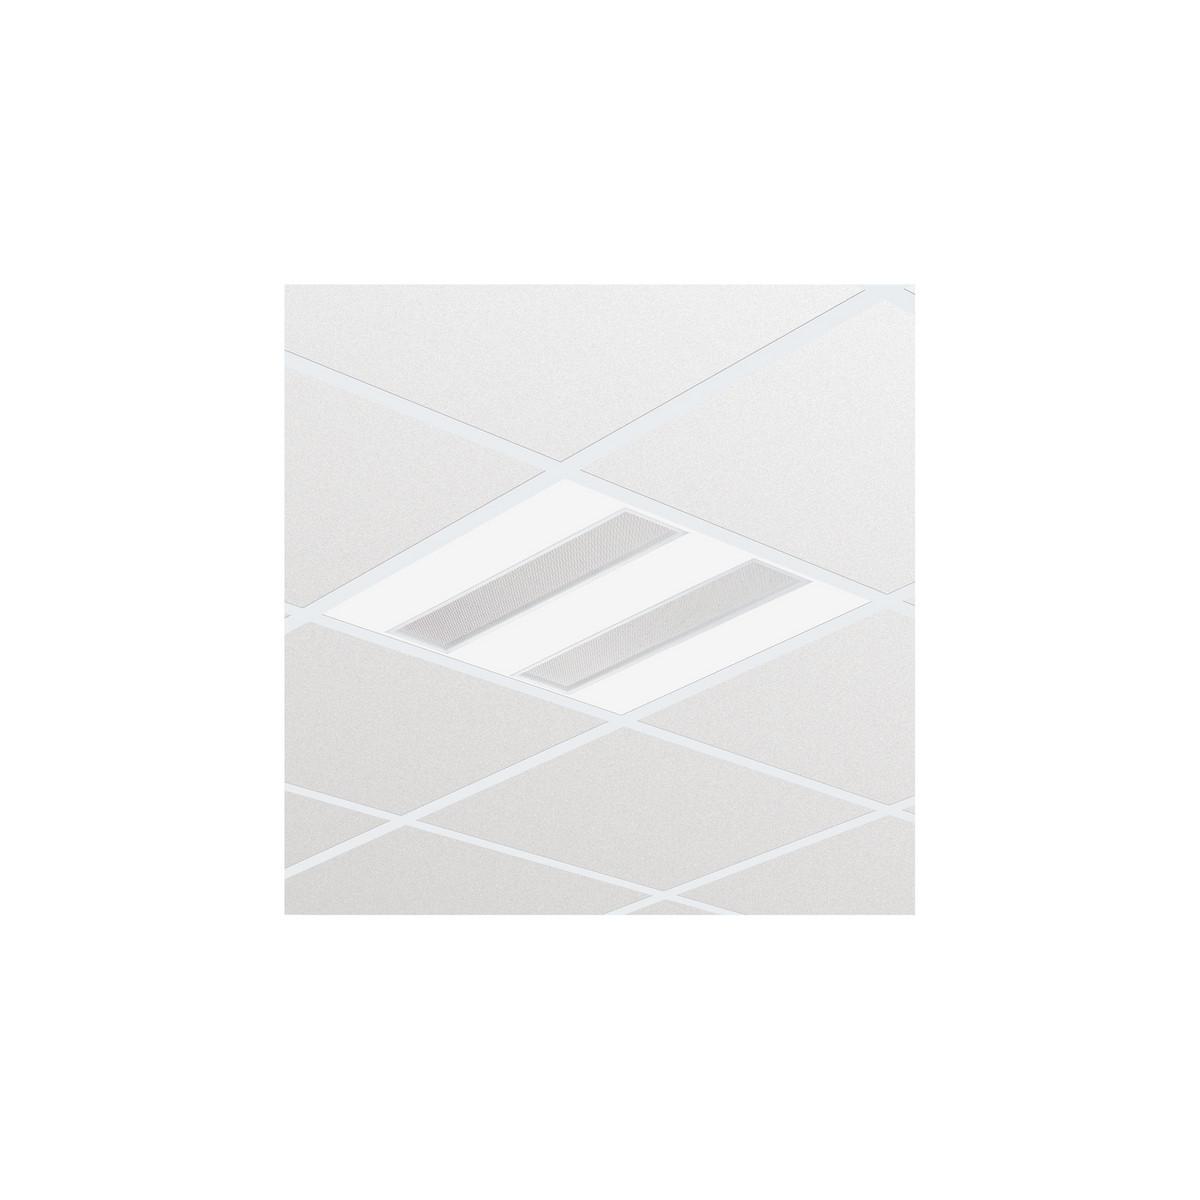 Philips FlexBlend Indbyg RC340B LED 3600lm/940 SRD 60x60 Synlig T-skinne MLO-optik Interact Ready